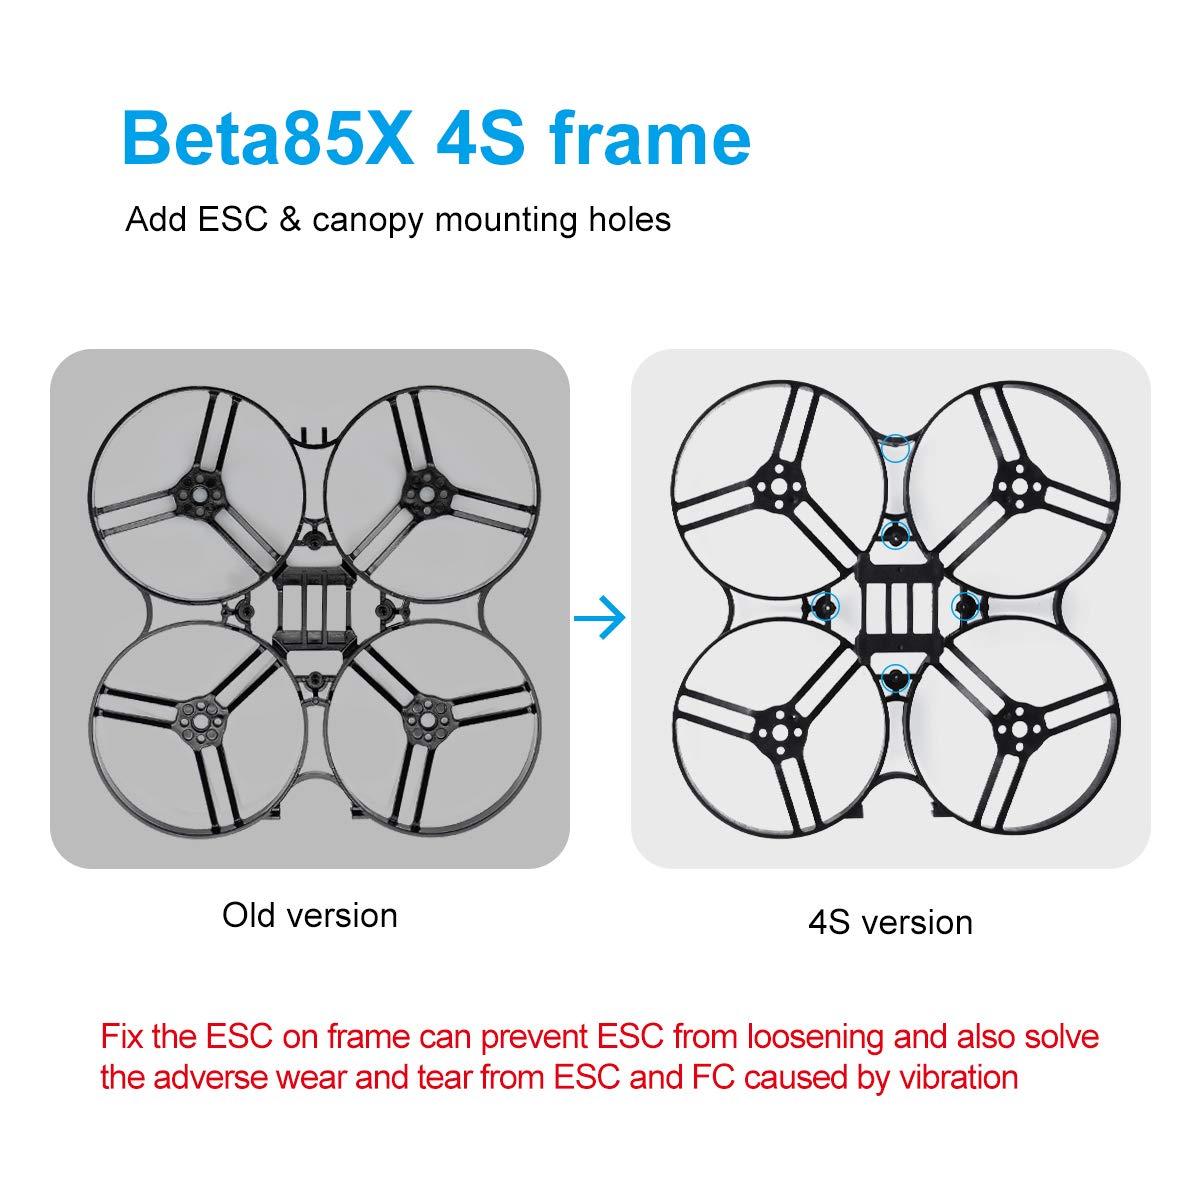 BETAFPV Beta85X 4S Cine Whoop Frame Kit Black Frame Stiffener Brace of Carbon Fiber for 1105 Brushless Motor Beta85X Cine Whoop